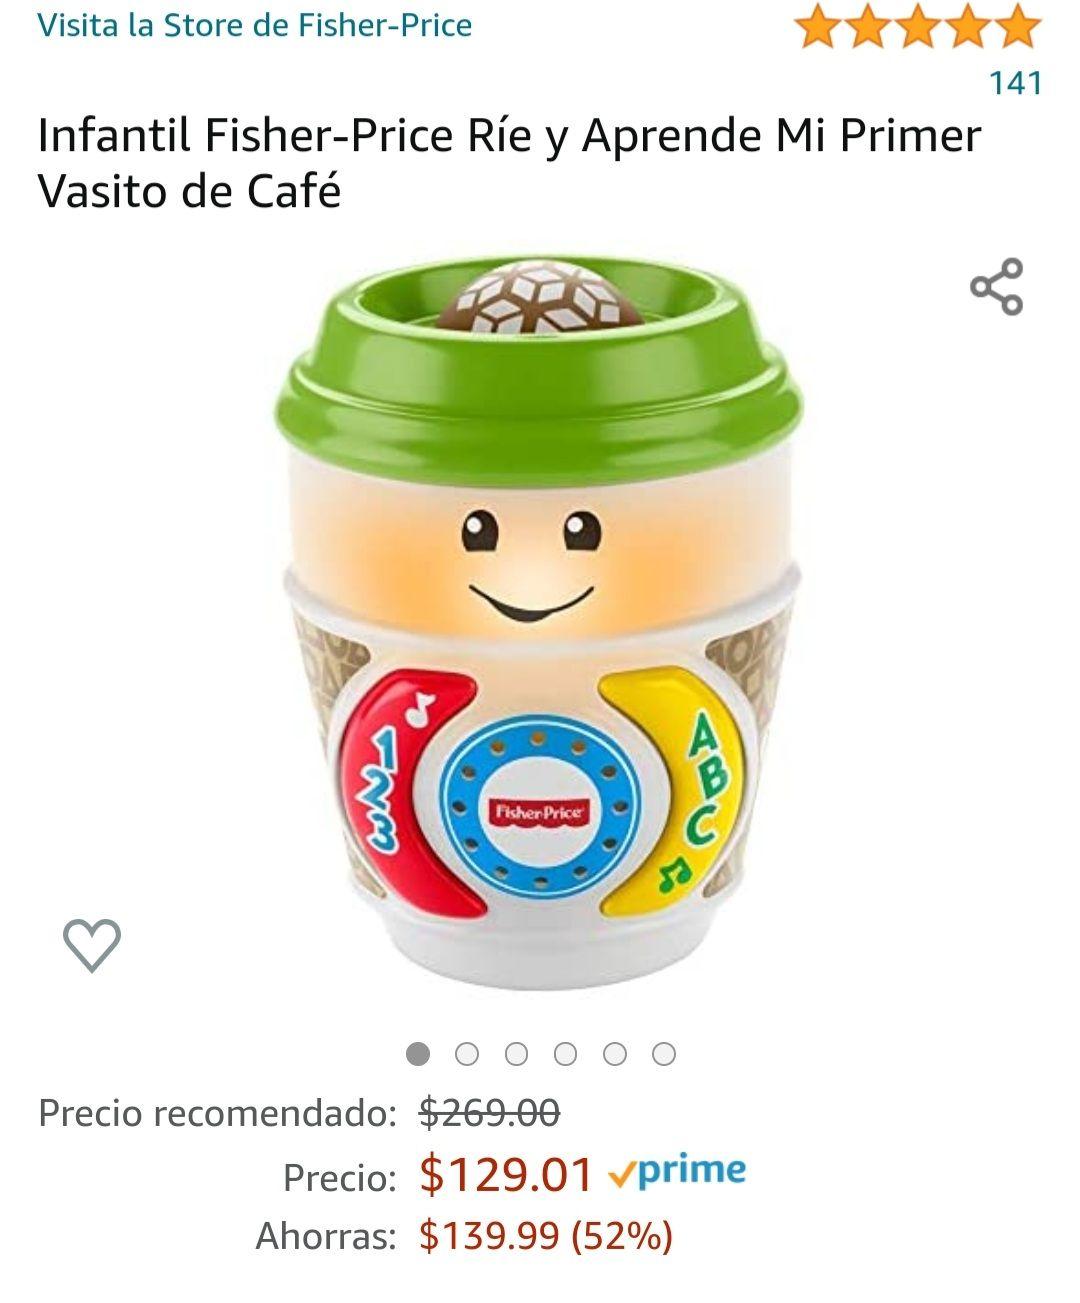 Amazon: Infantil Fisher-Price Ríe y Aprende Mi Primer Vasito de Café